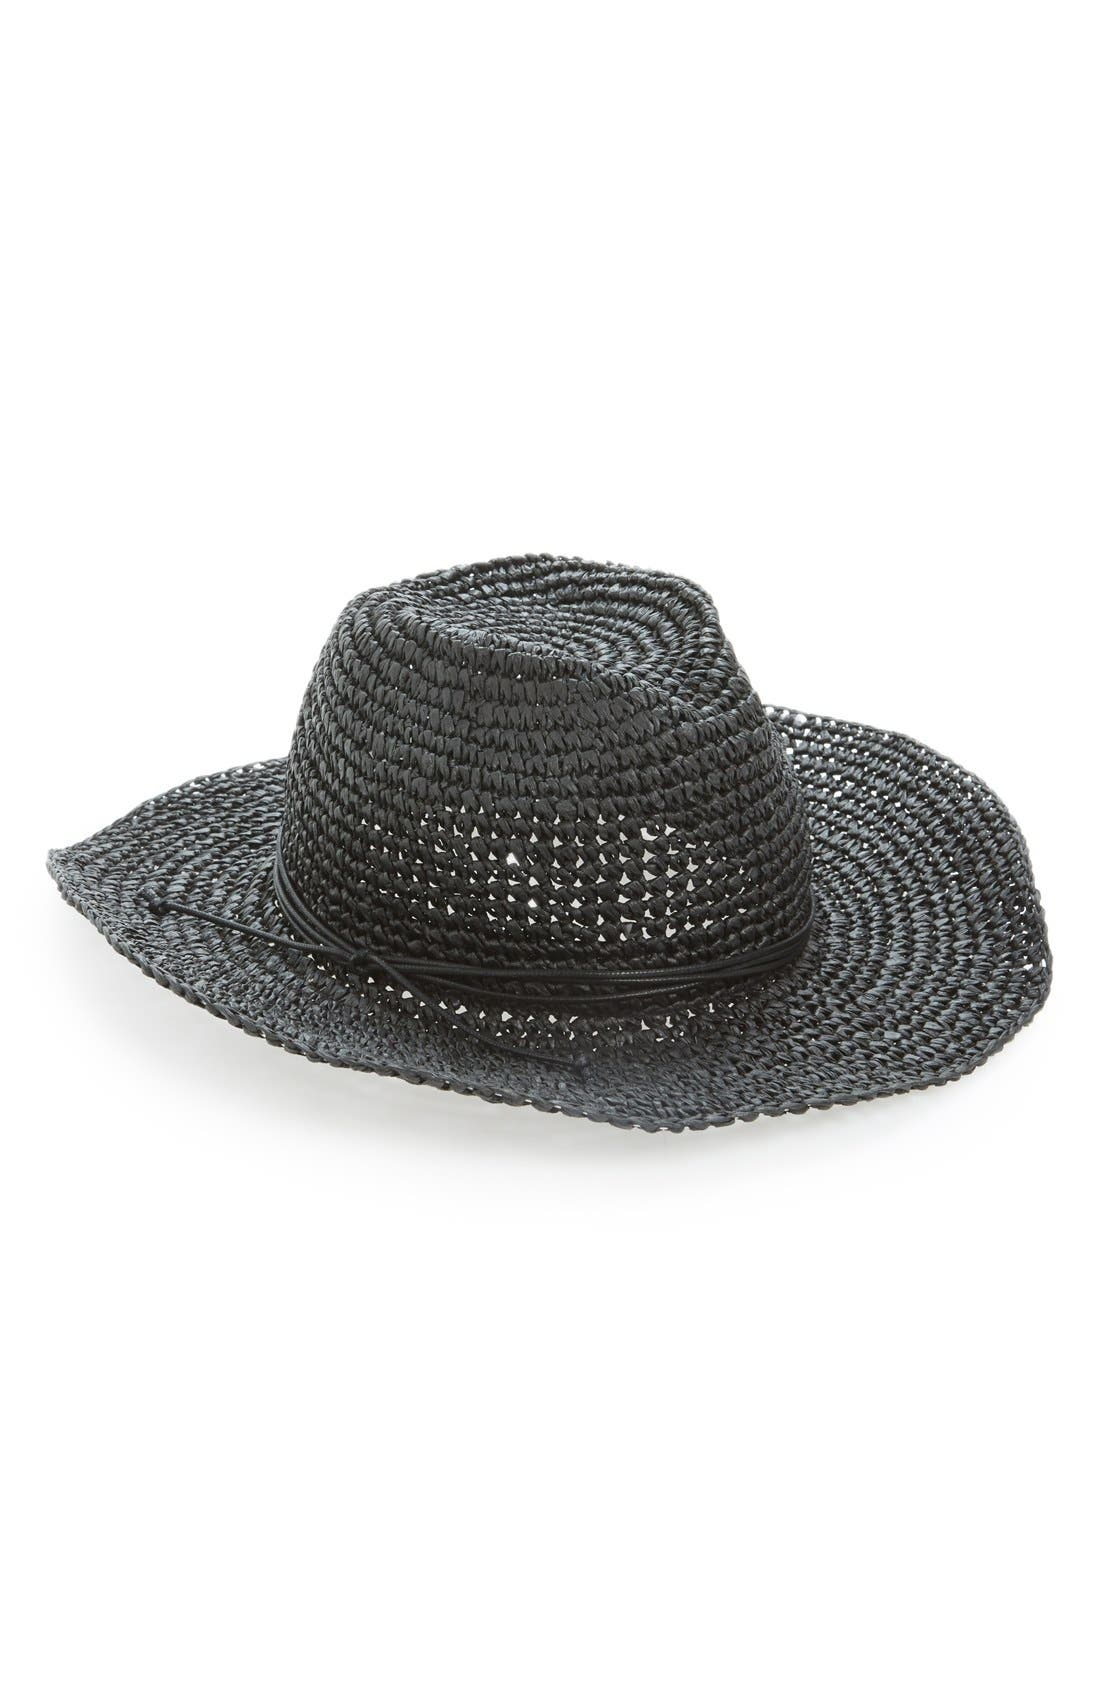 HINGE 'Layla' Straw Cowboy Hat, Main, color, 001